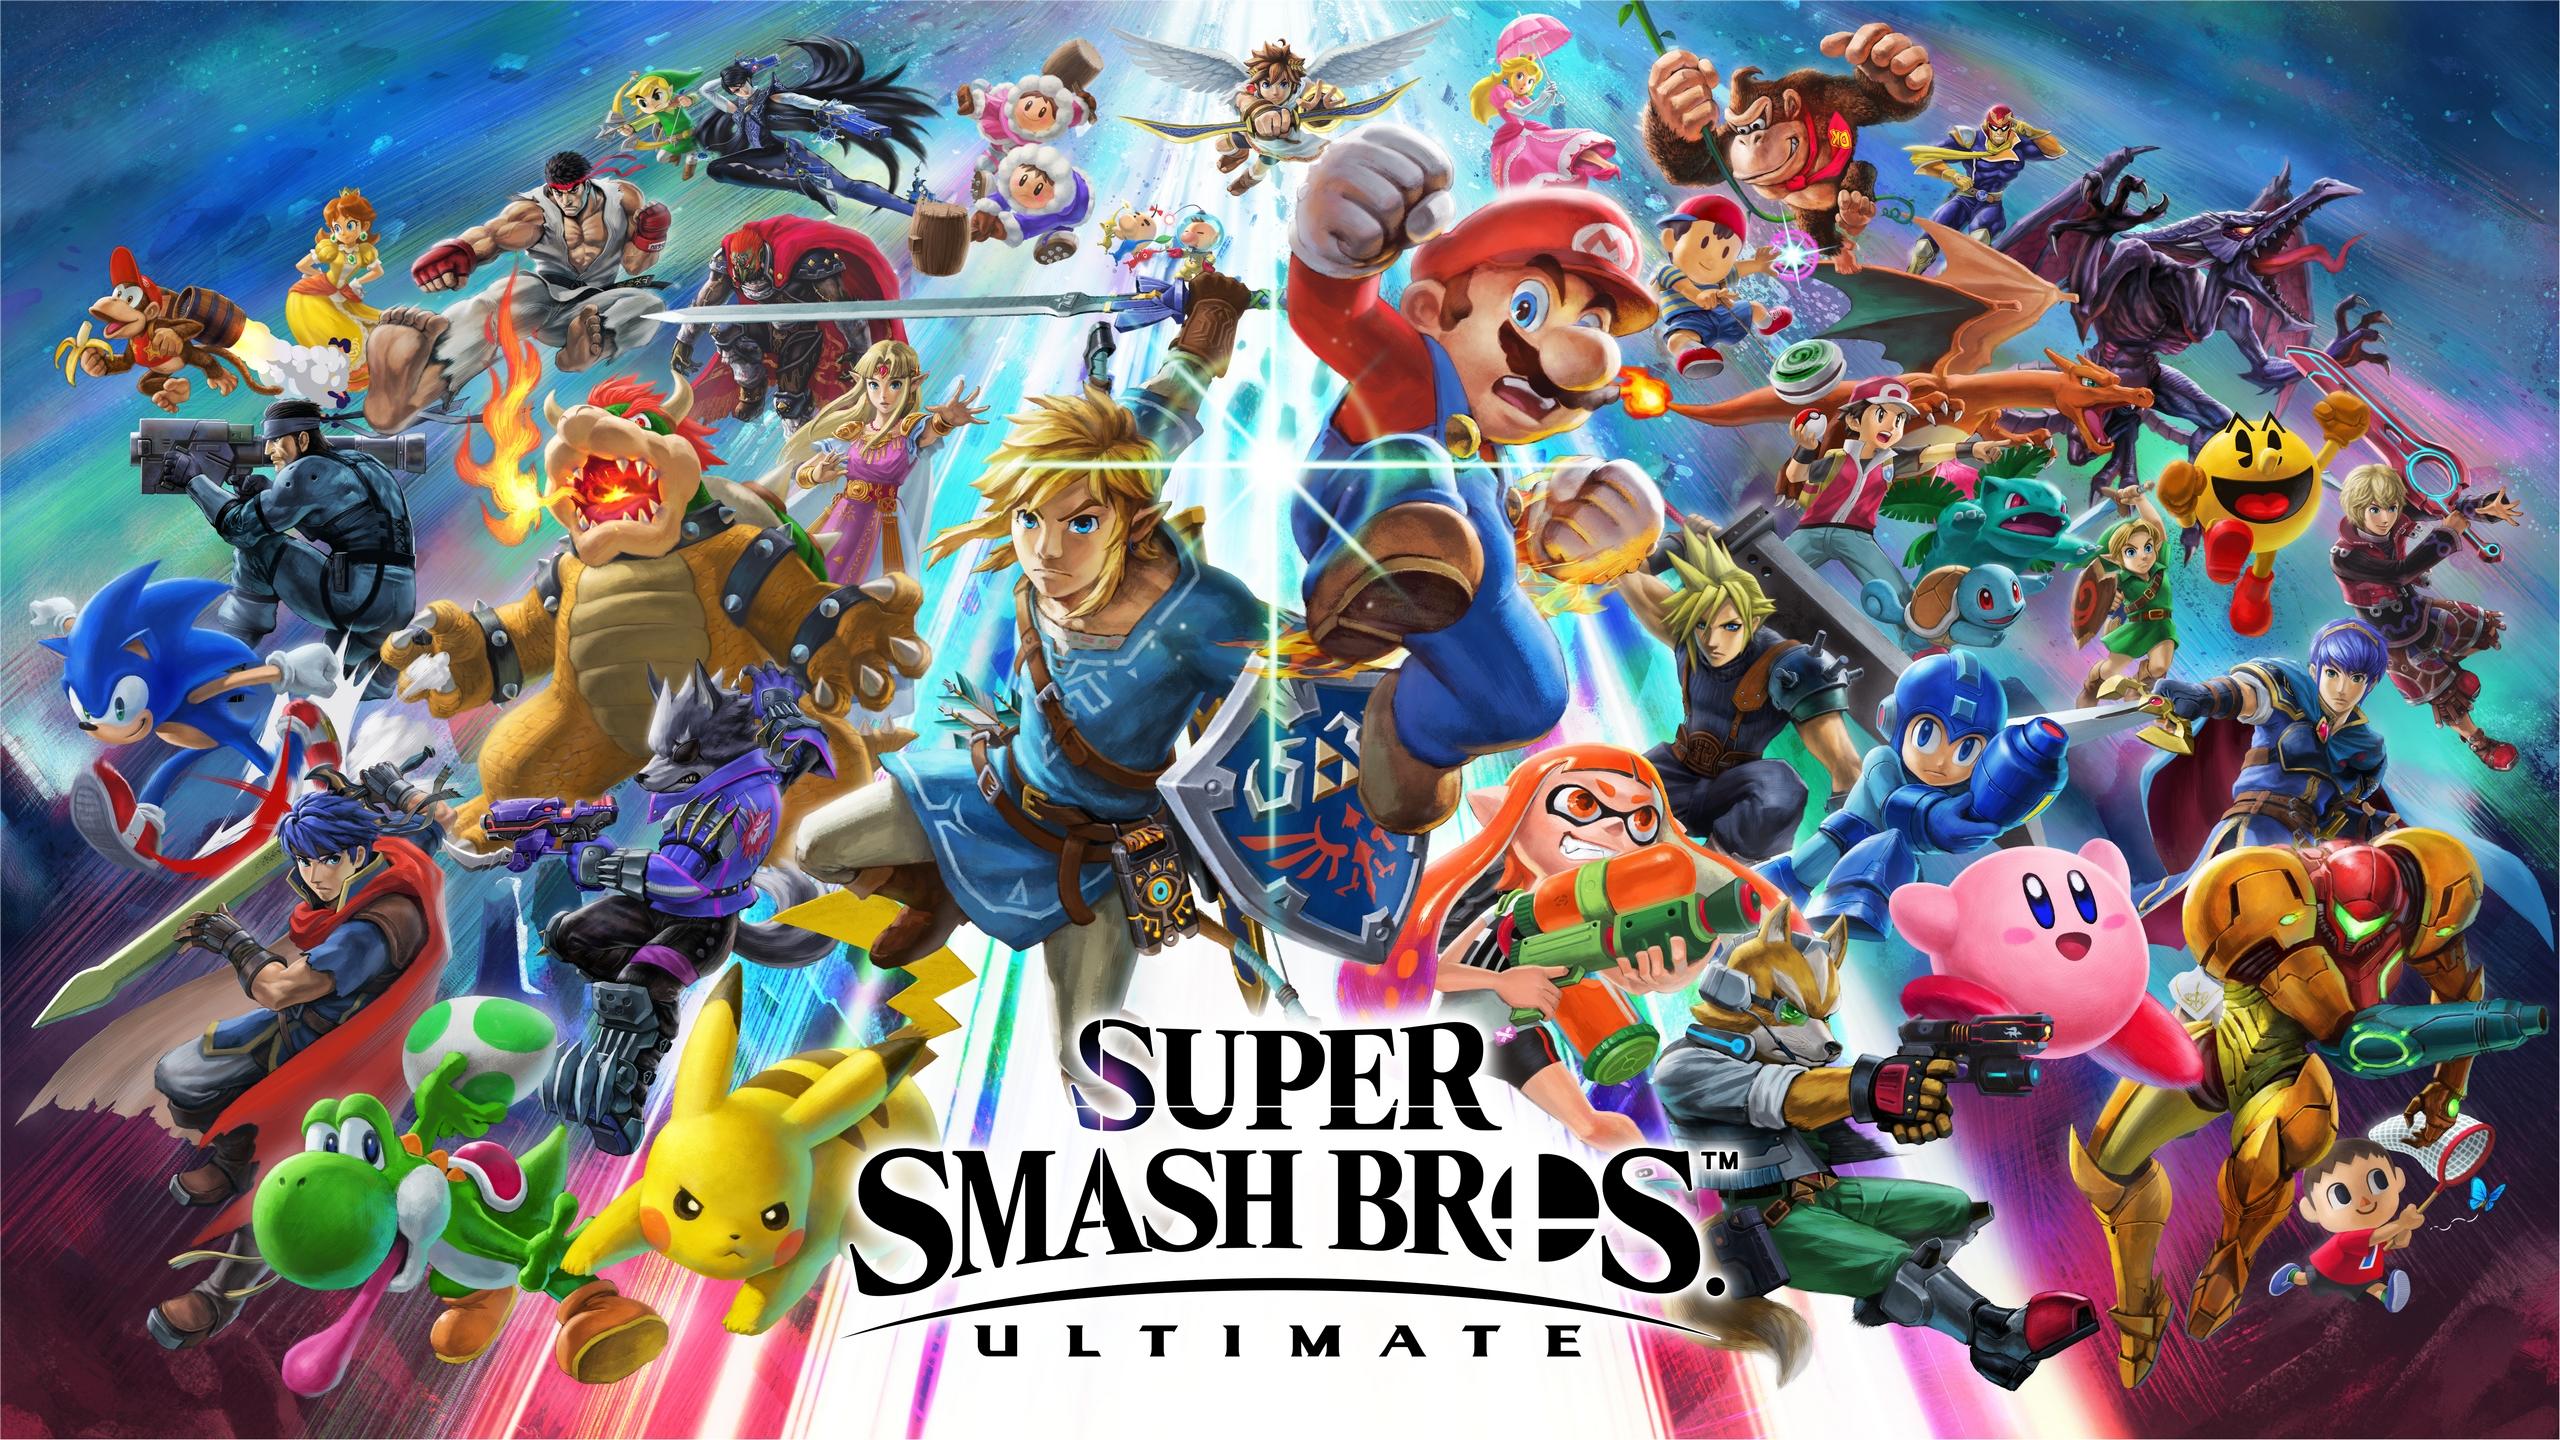 General 2560x1440 Super Smash Bros. Ultimate Super Smash Brothers video games Nintendo video game art